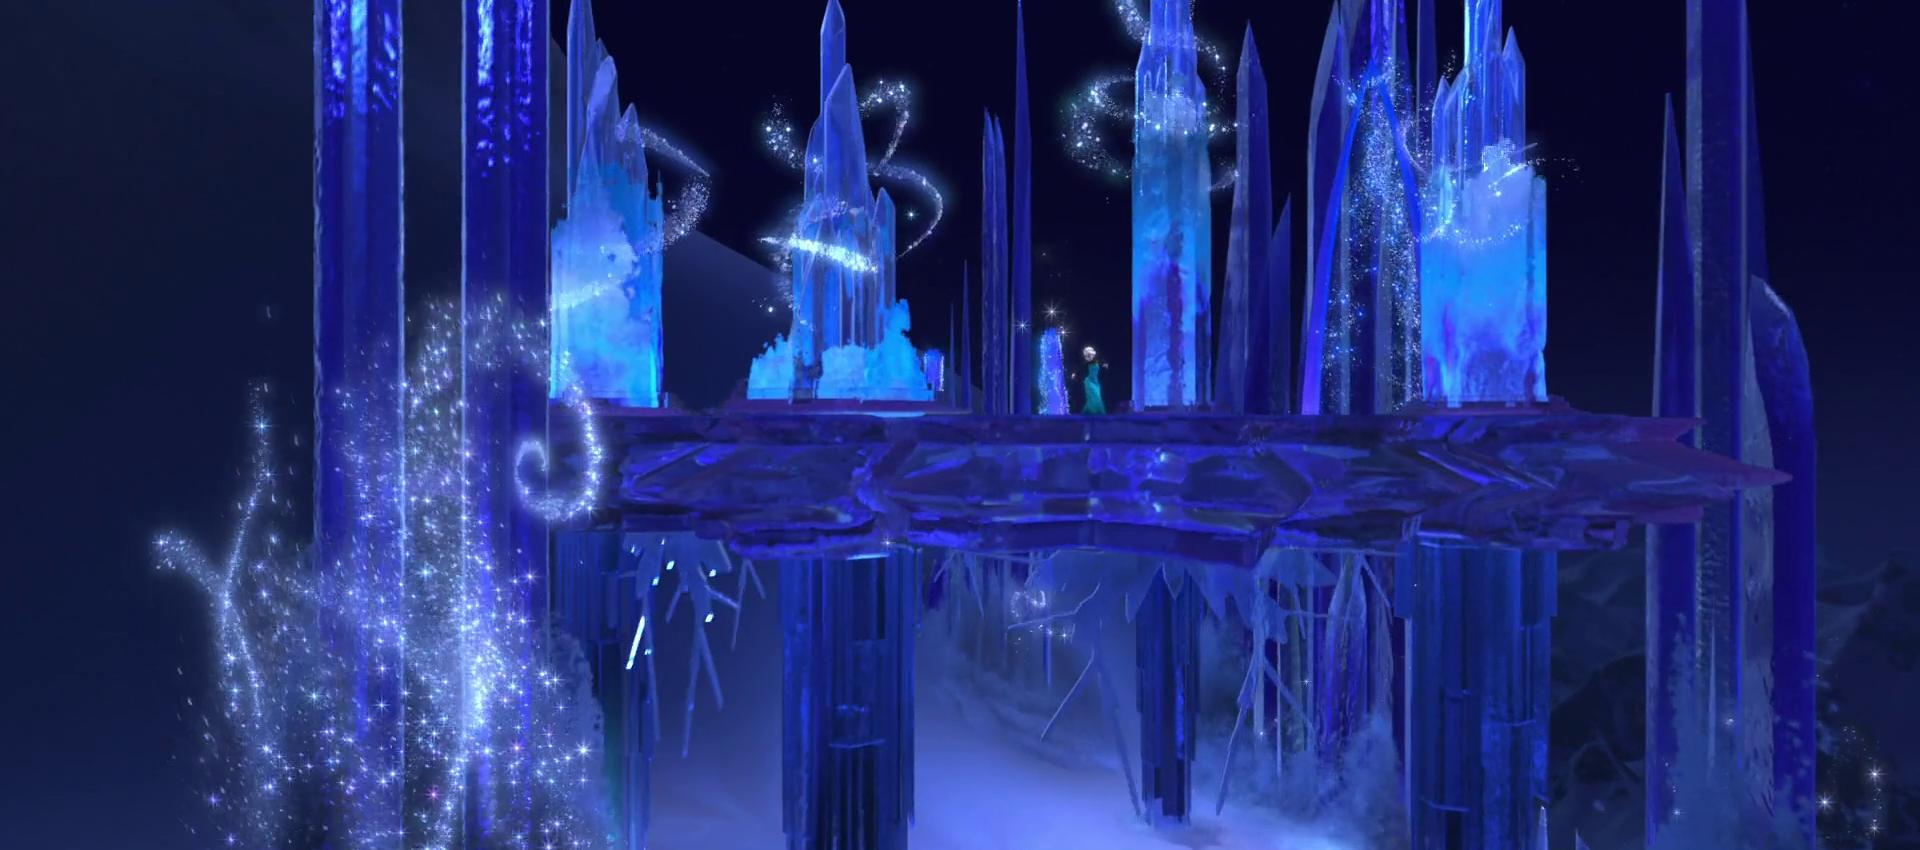 dibujo castillo frozen  Buscar con Google  valeria  Pinterest